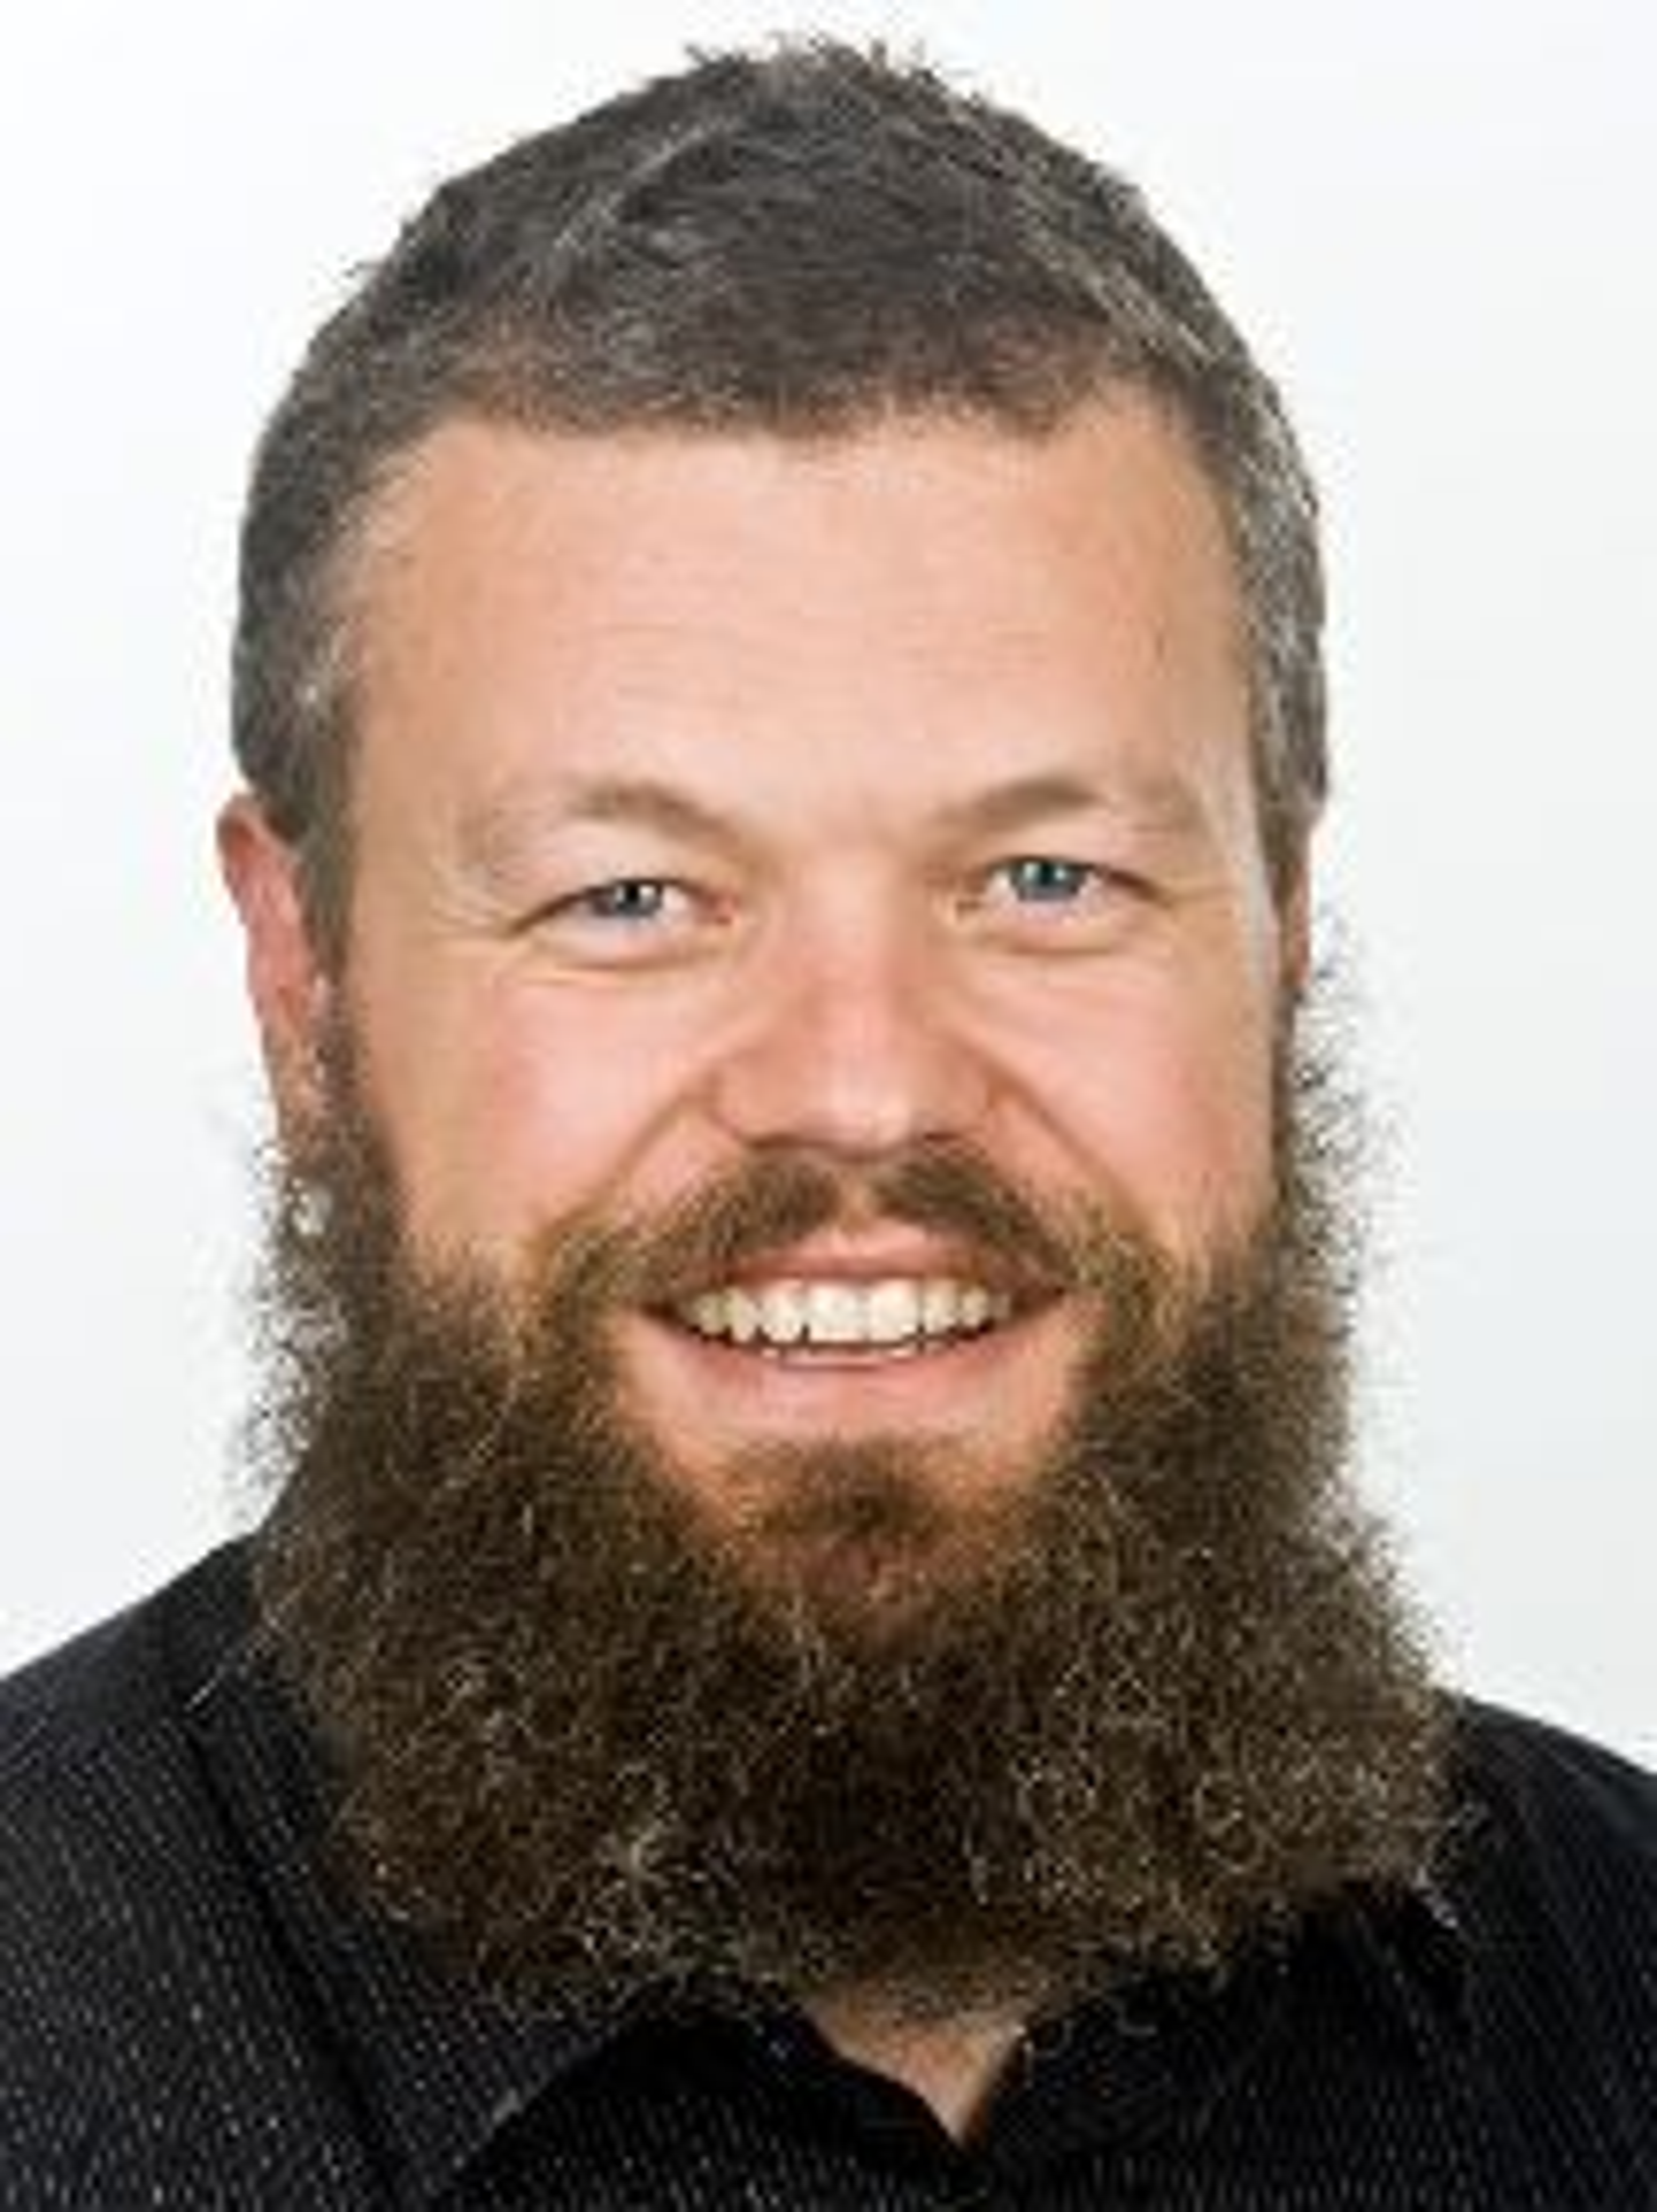 Torgeir Waterhouse i IKT-Norge.